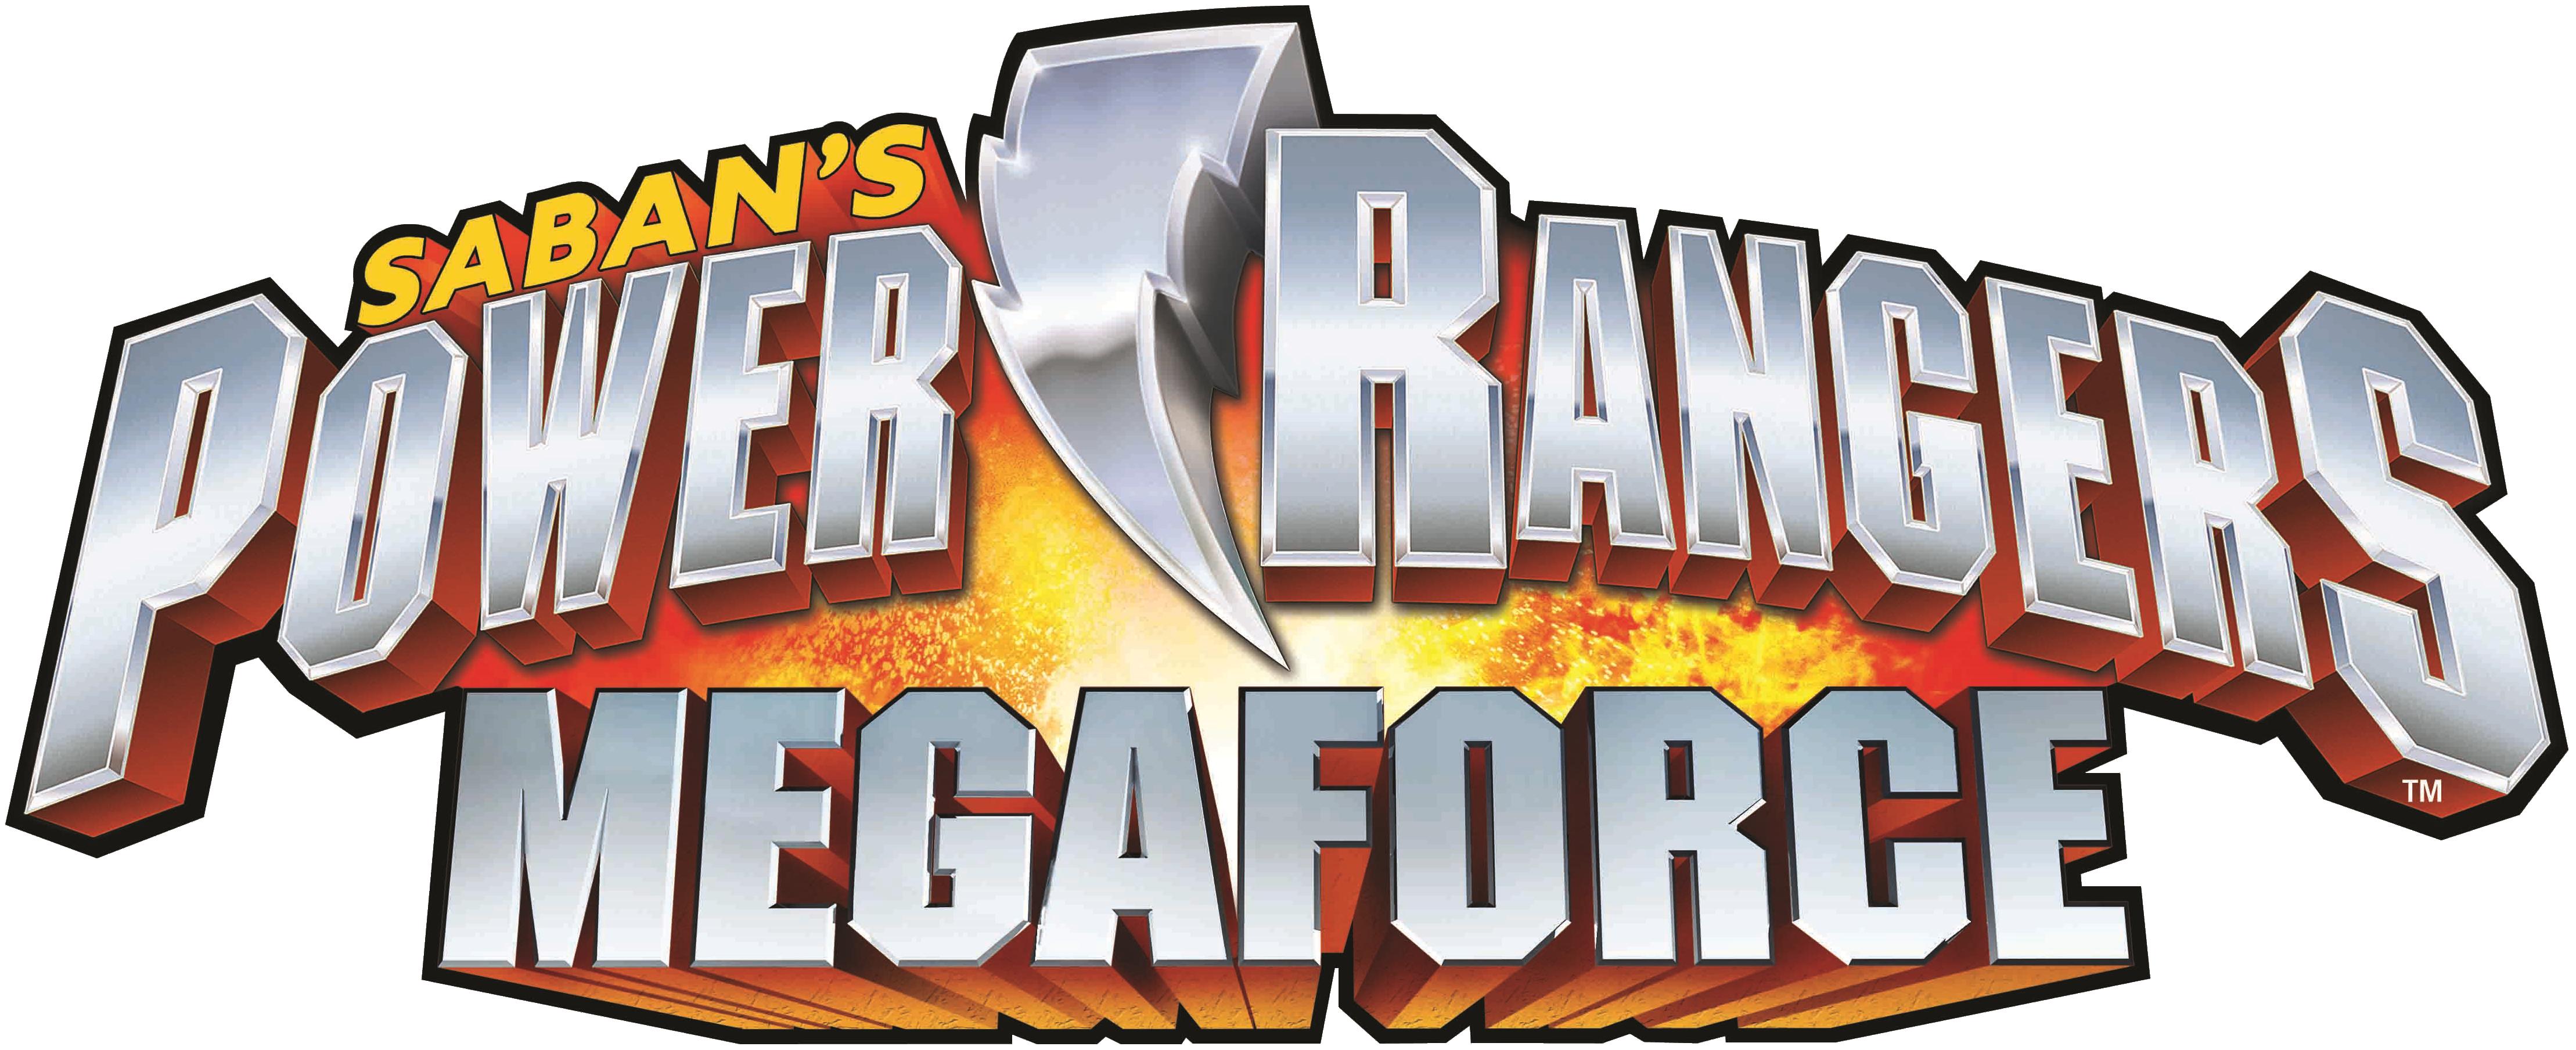 Power Rangers Megaforce (toyline)